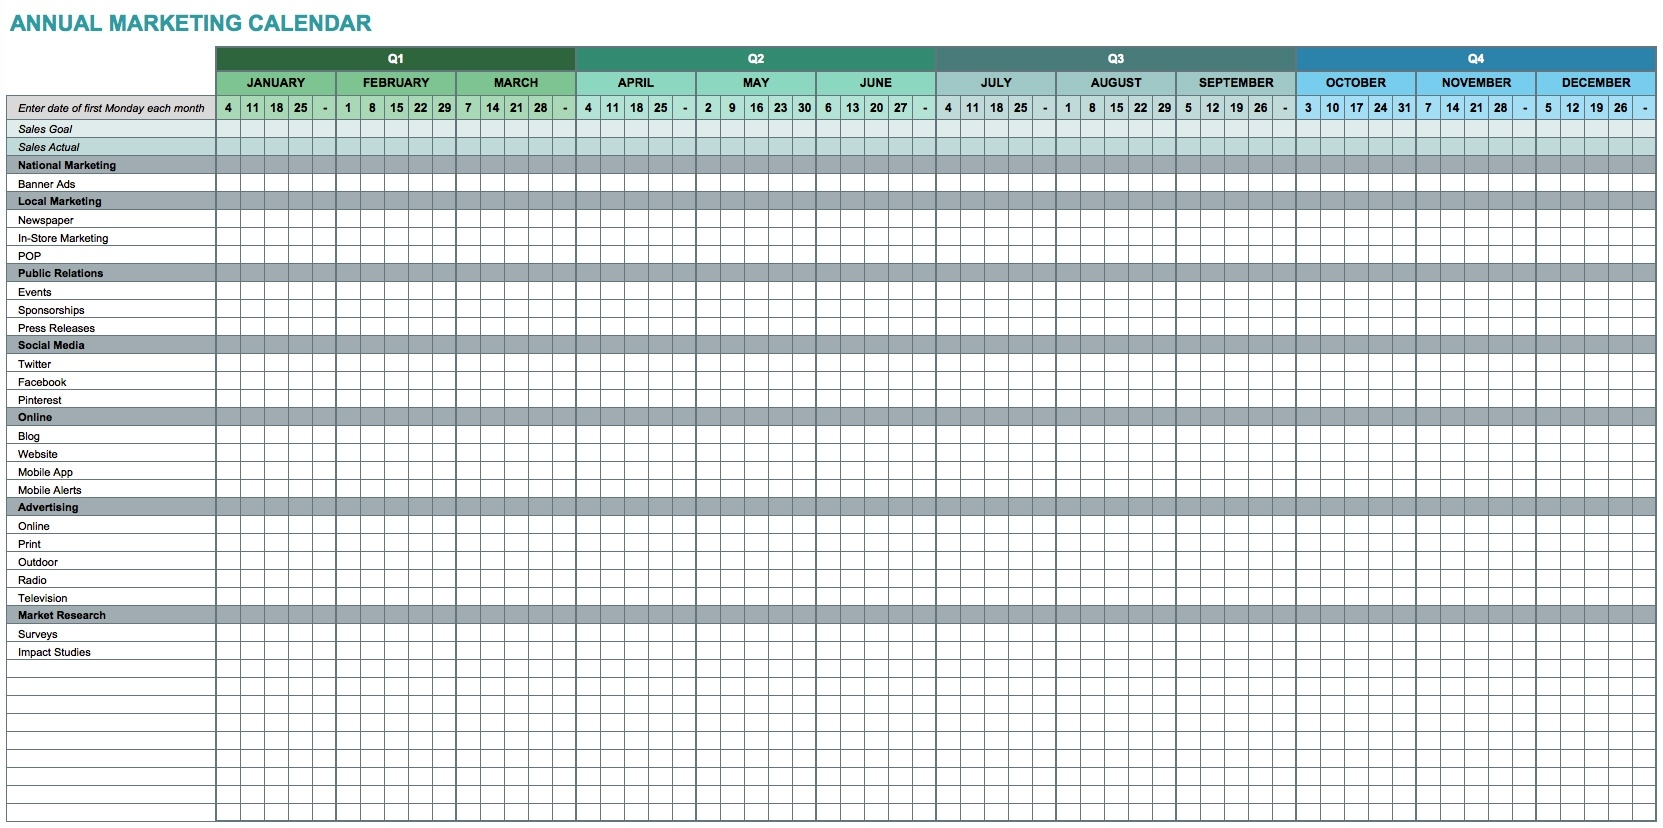 9 Free Marketing Calendar Templates For Excel - Smartsheet  Annual Event Calendar Template Excel